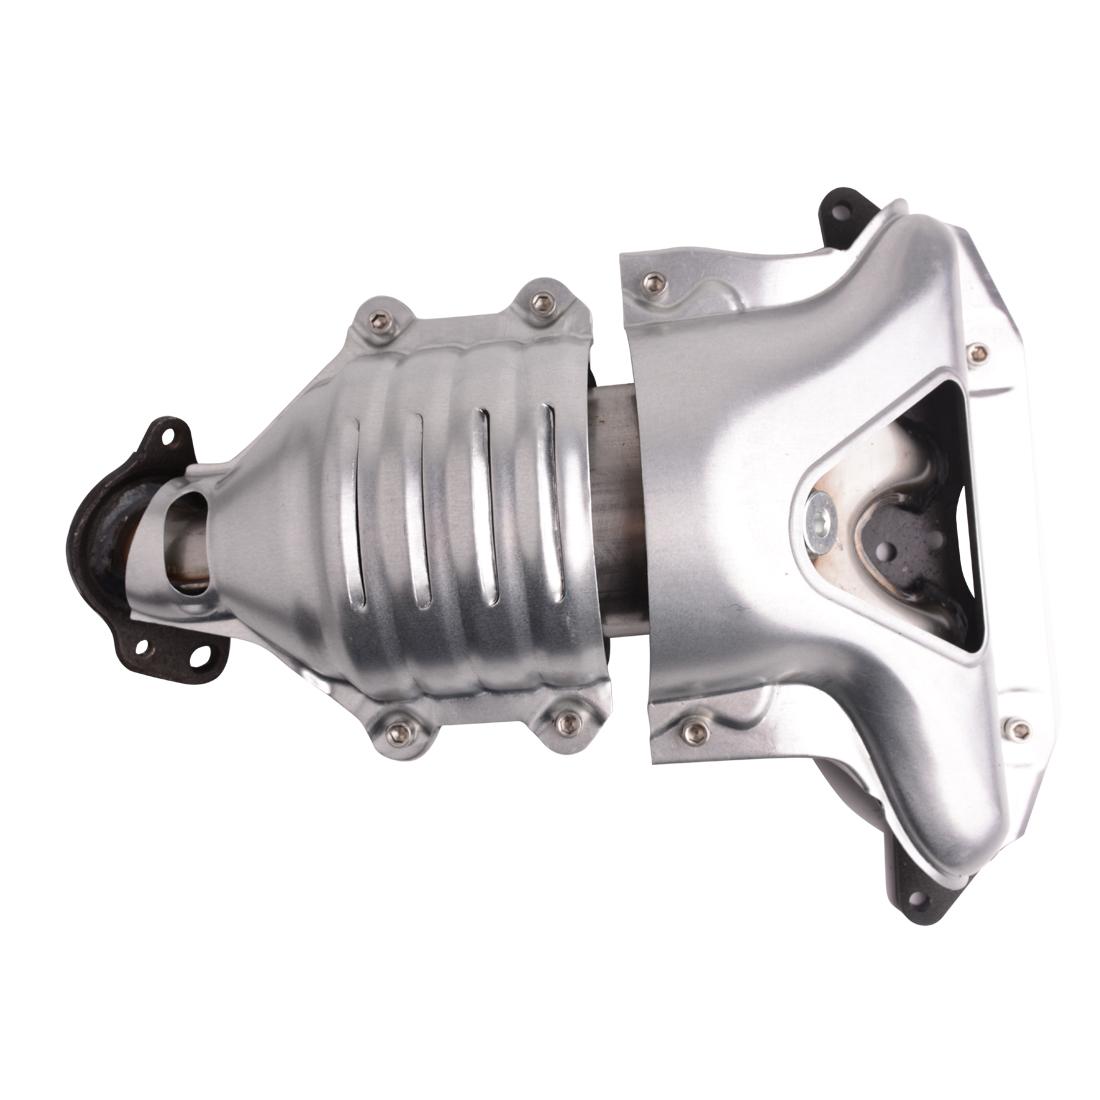 Catalytic Converter 1 7l Exhaust Manifold 673 608 674 For Honda Civic 01 05 Dx Lx Cx L4 Sohc Reph960325